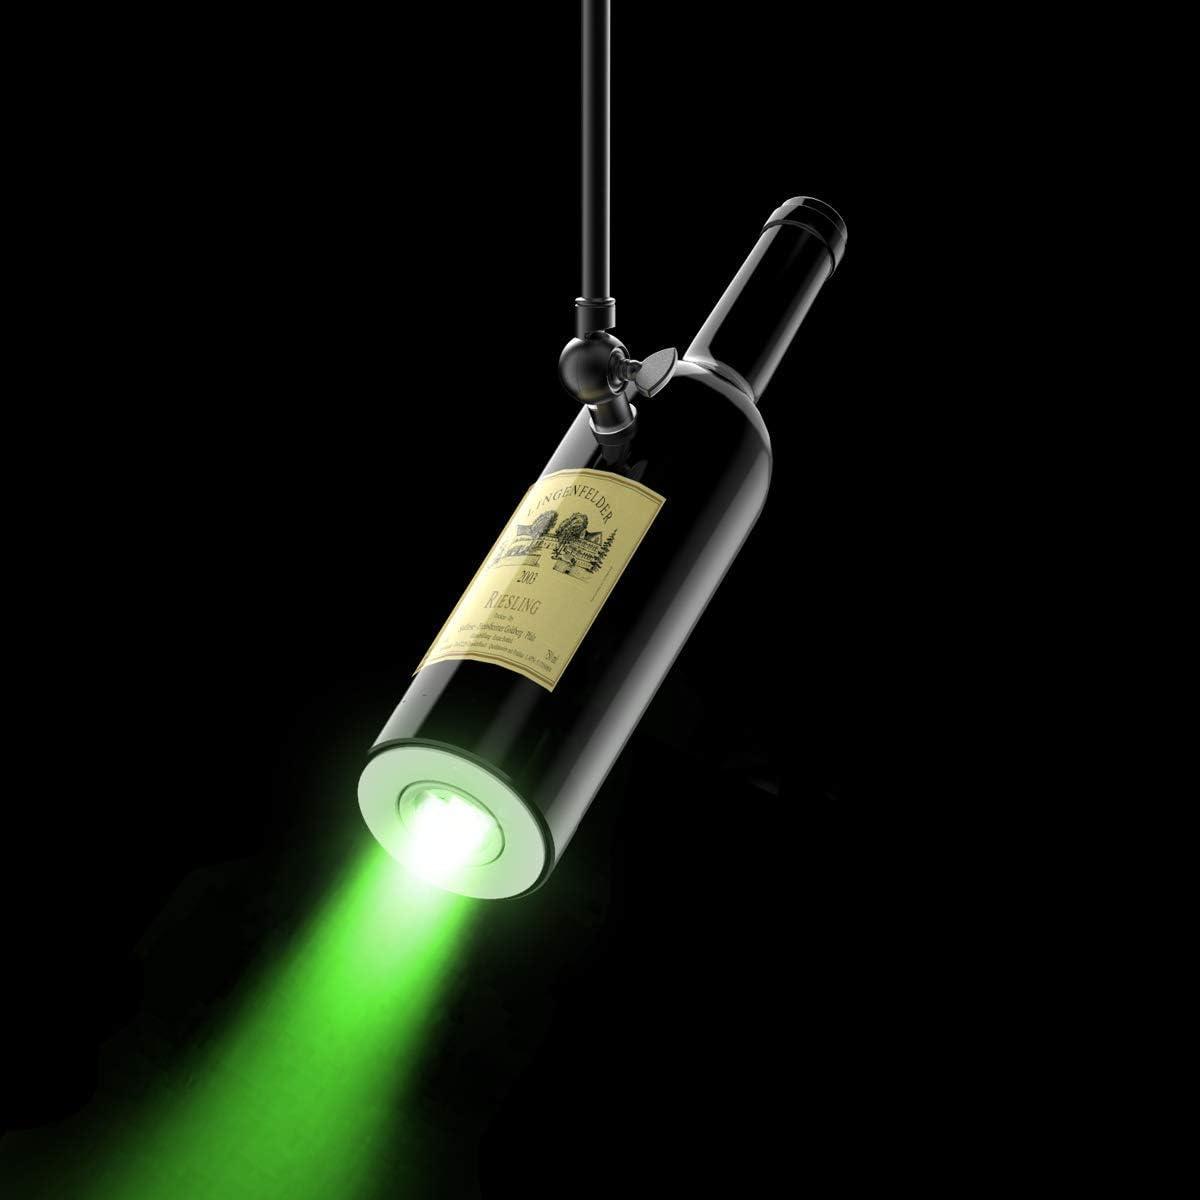 HSL Spot Lights Indoor Track Chandelier Iamps Wine Bottle are Used for Indoor LED Decorative Lights, Wine Cabinets, Bars, Nightclubs (Mint Green)